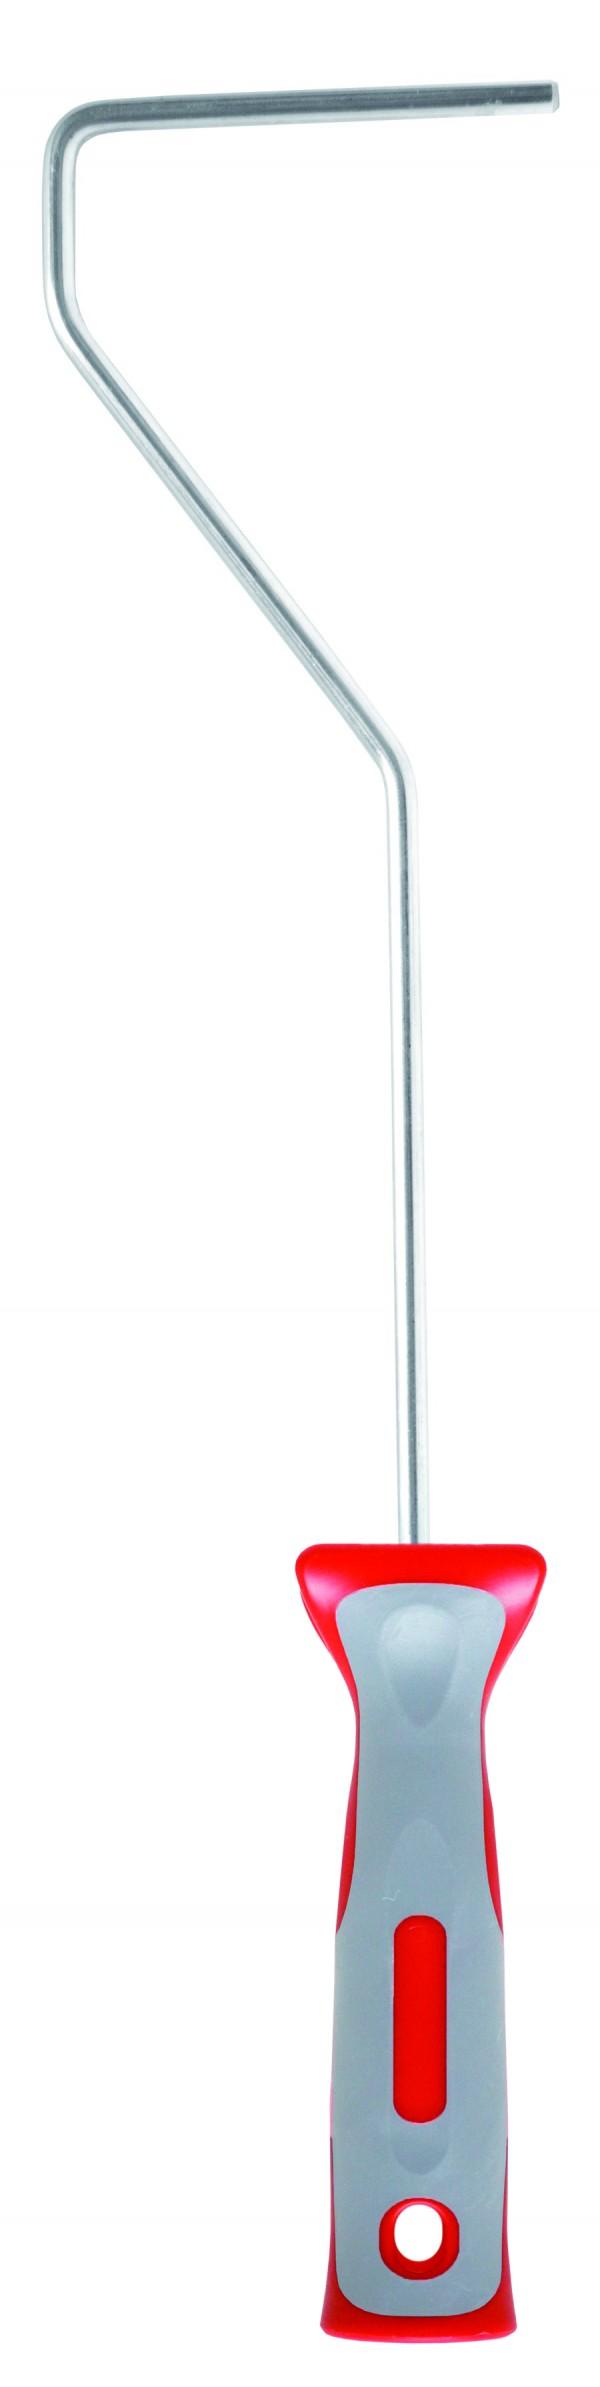 Držiak na valček, pozink.Soft Grip 10/39cm, pr. 6mm